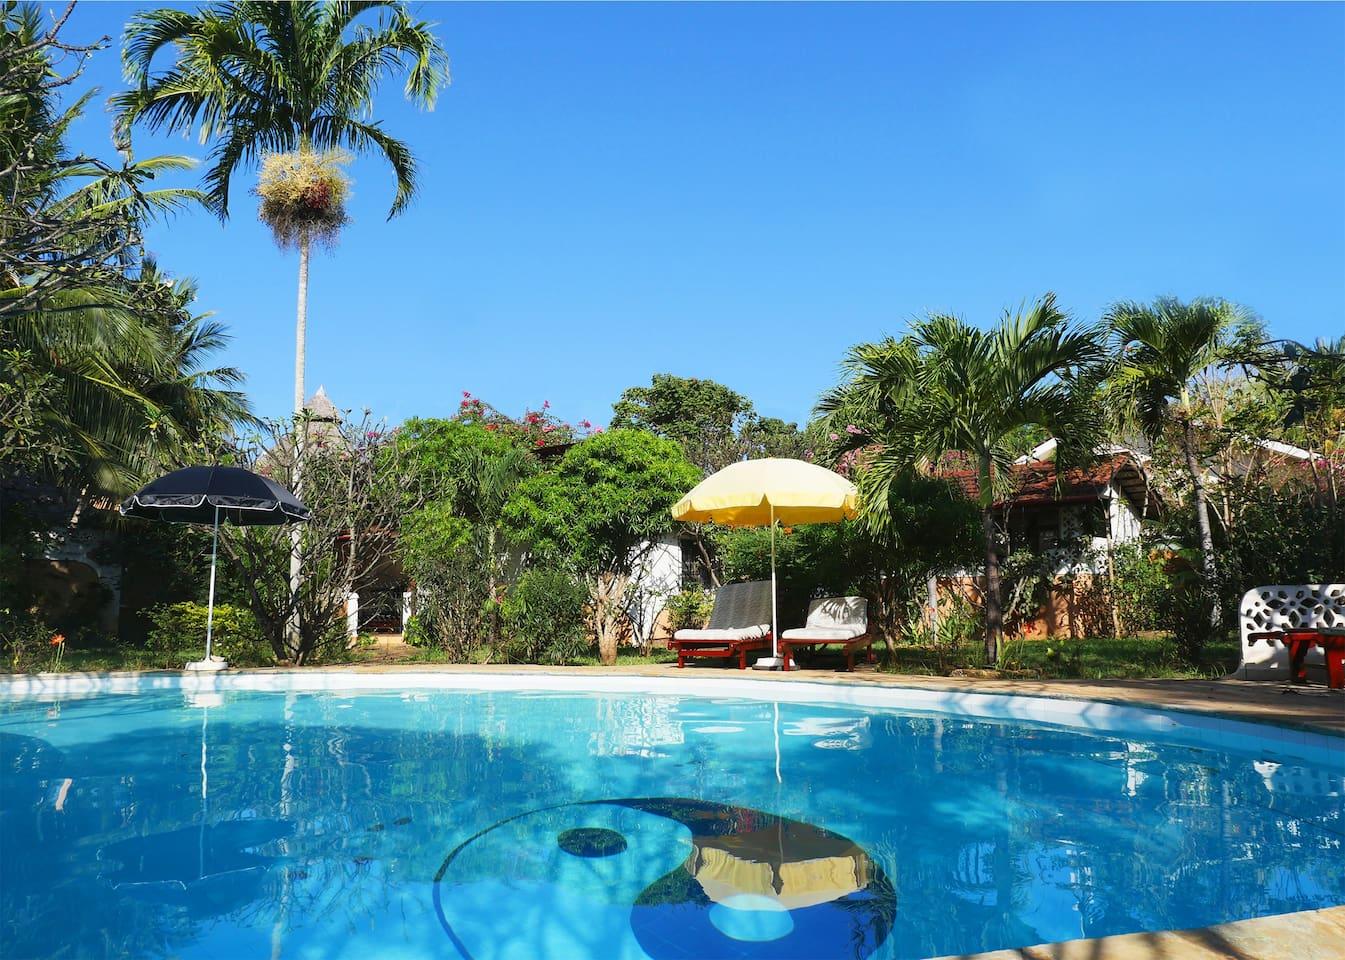 Der Pool - ganzjährig benutzbar. *The pool, opened 365 days a year.